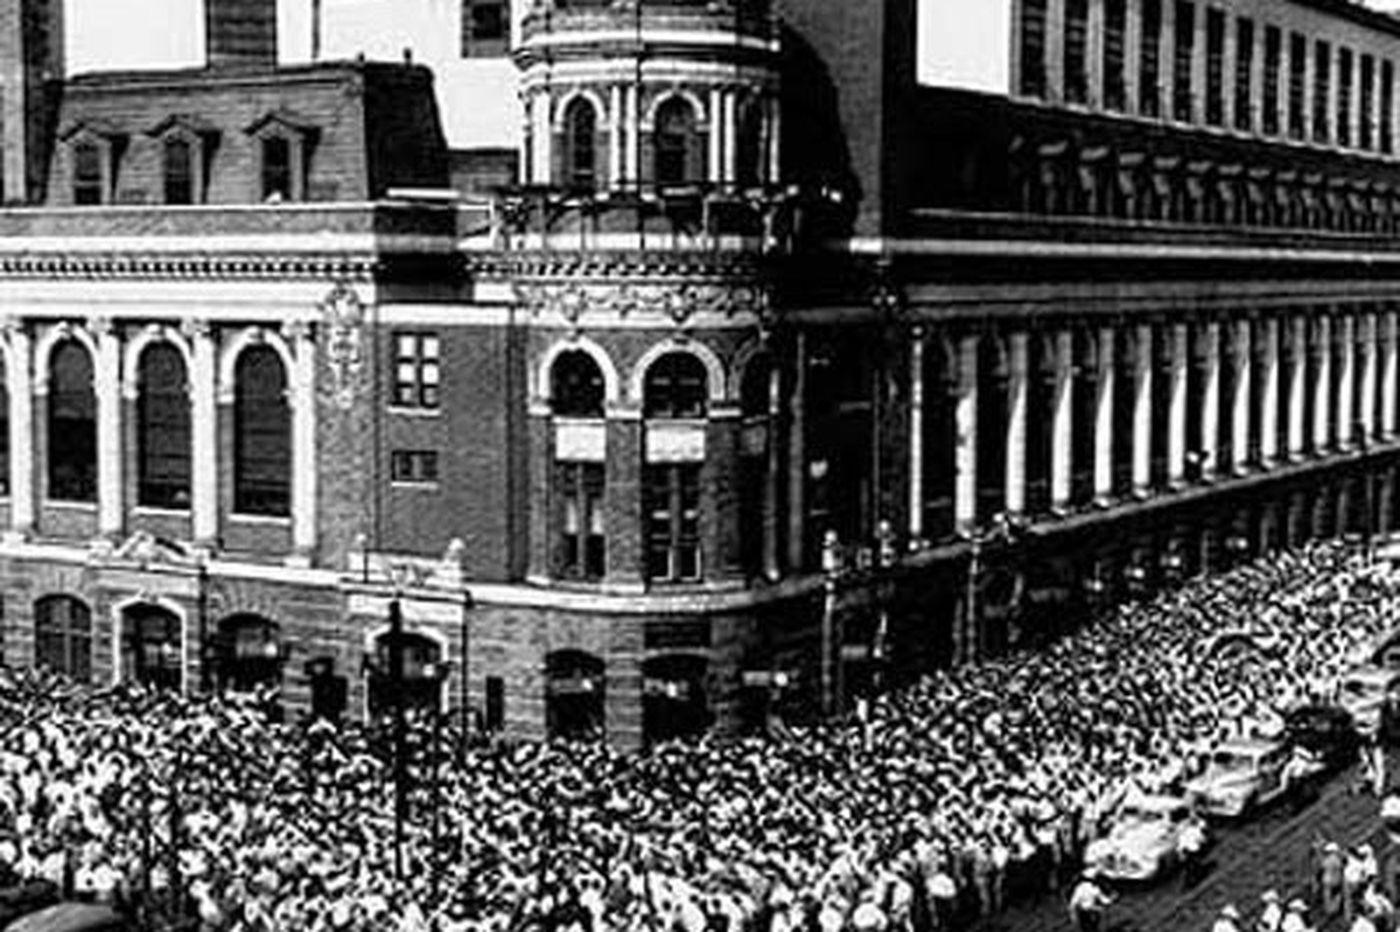 The Athletics' last game in Philadelphia